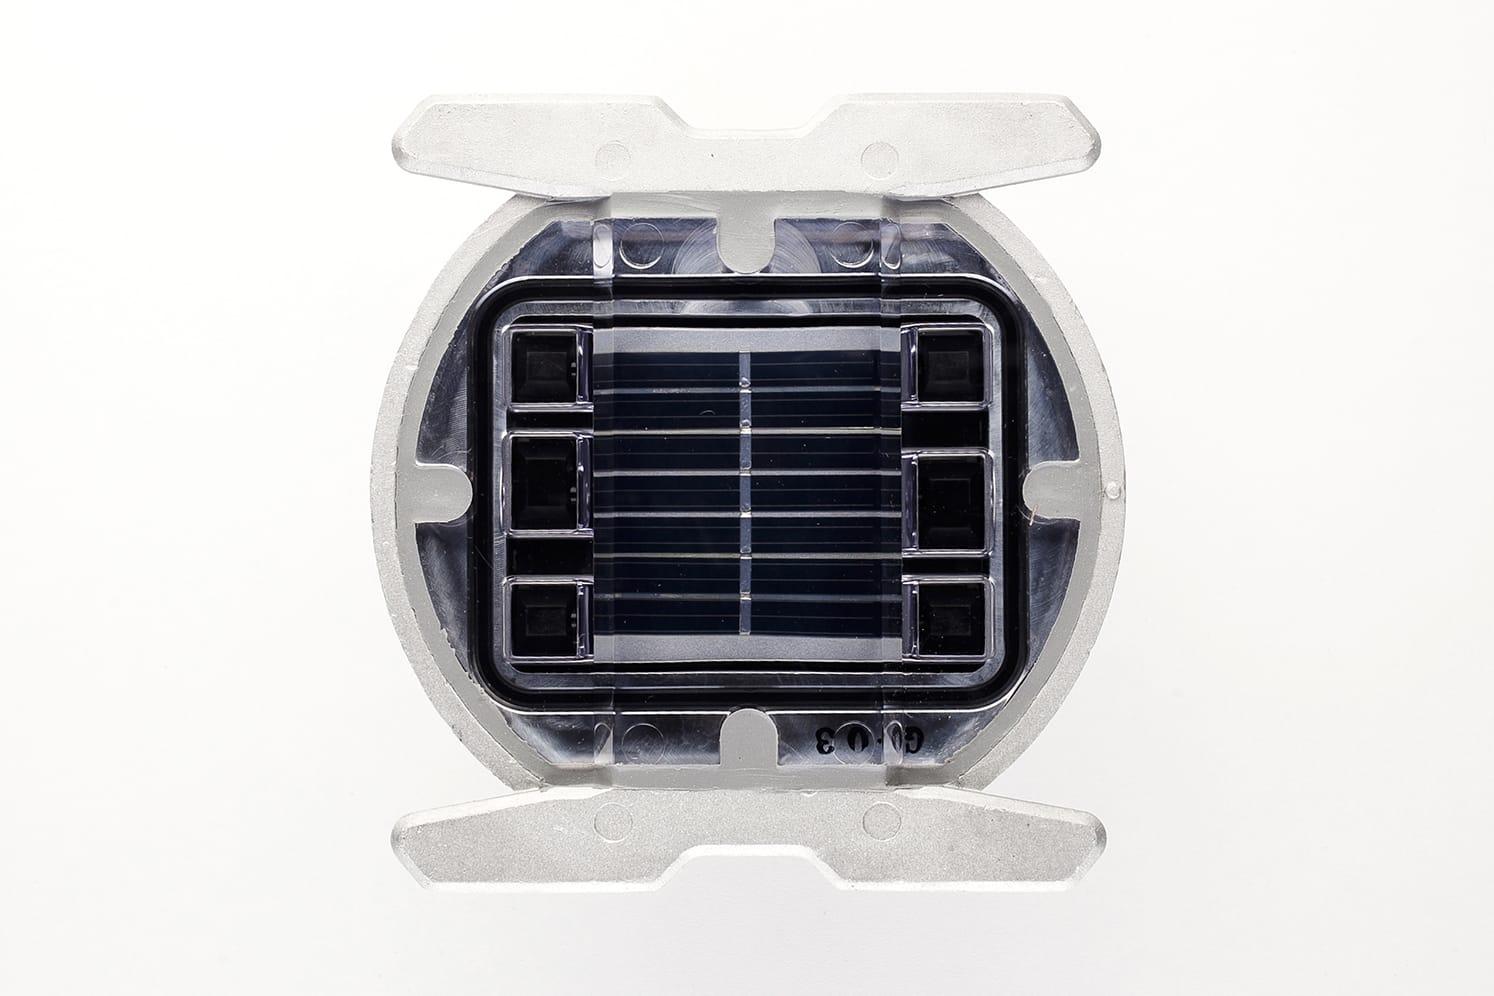 Plot solaire routier giratoire ECO-142